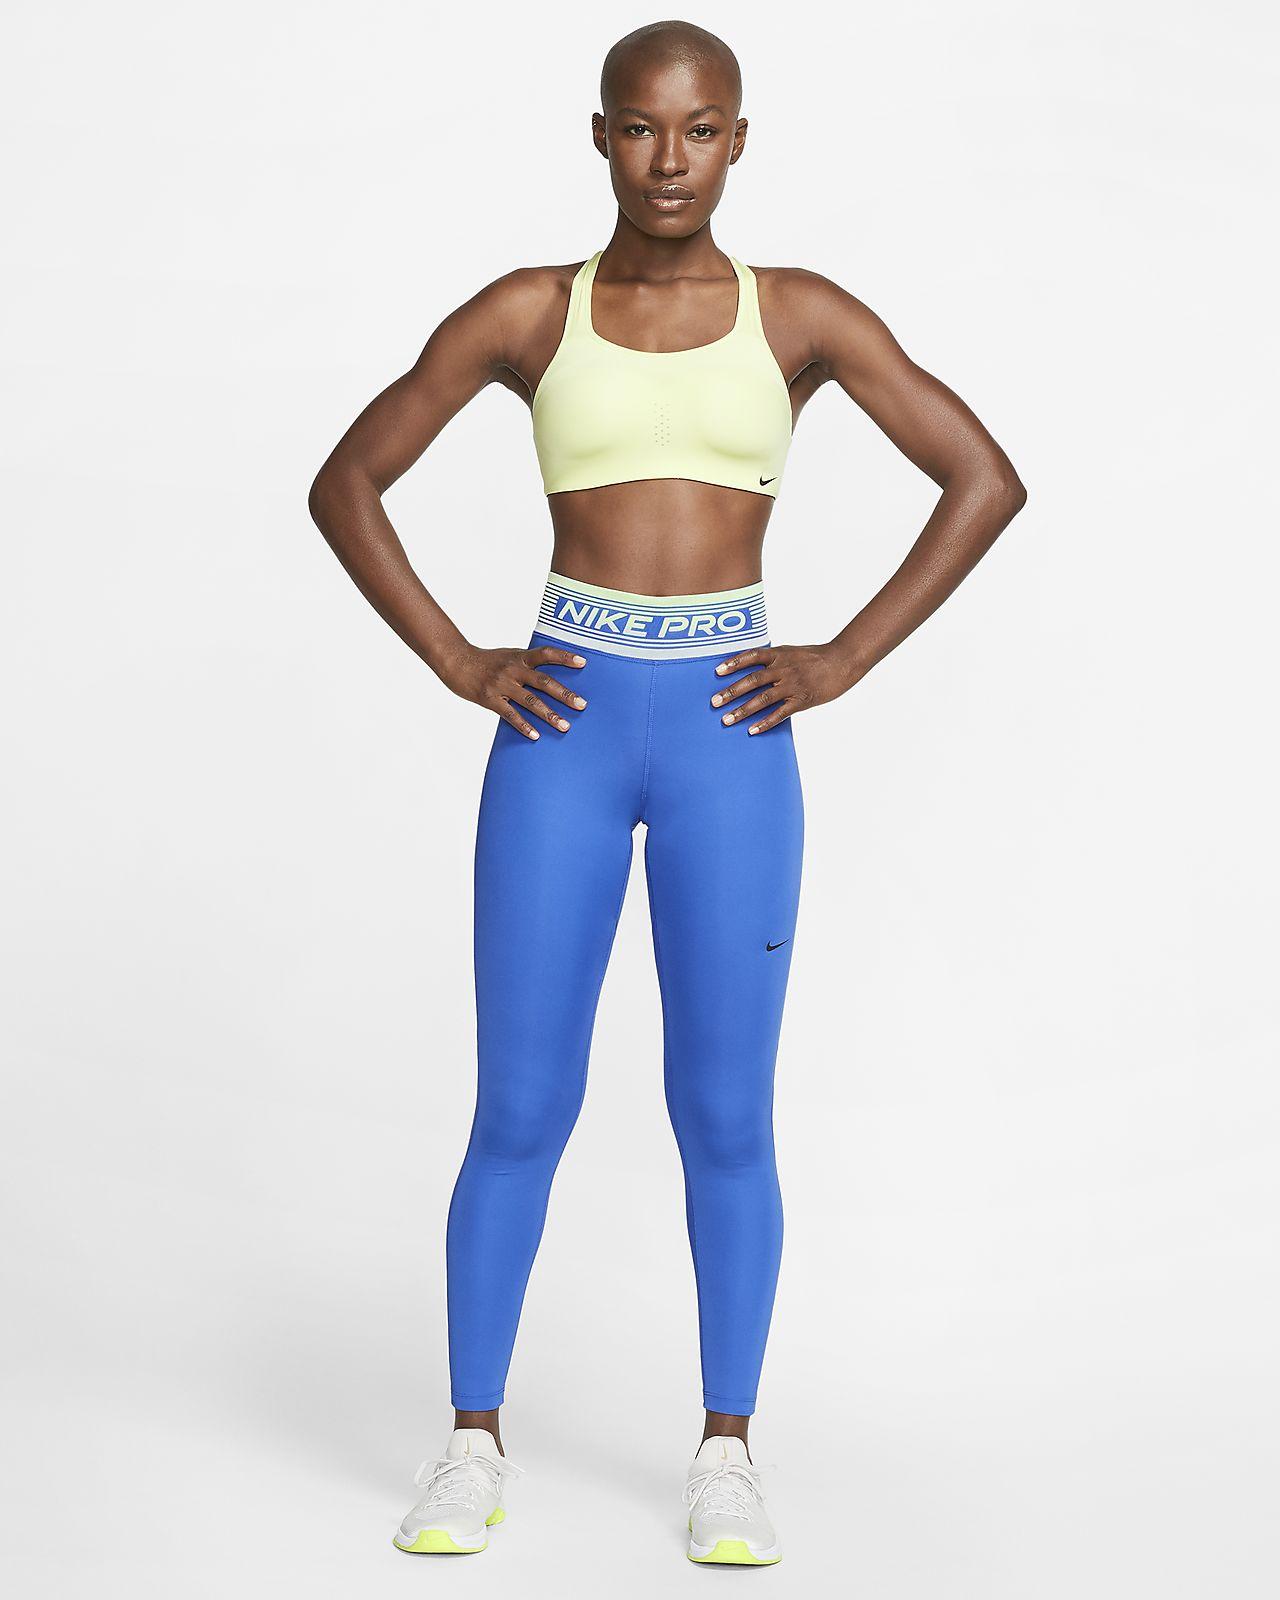 Nike Bra Alpha Support Women's Sports High O80wknP